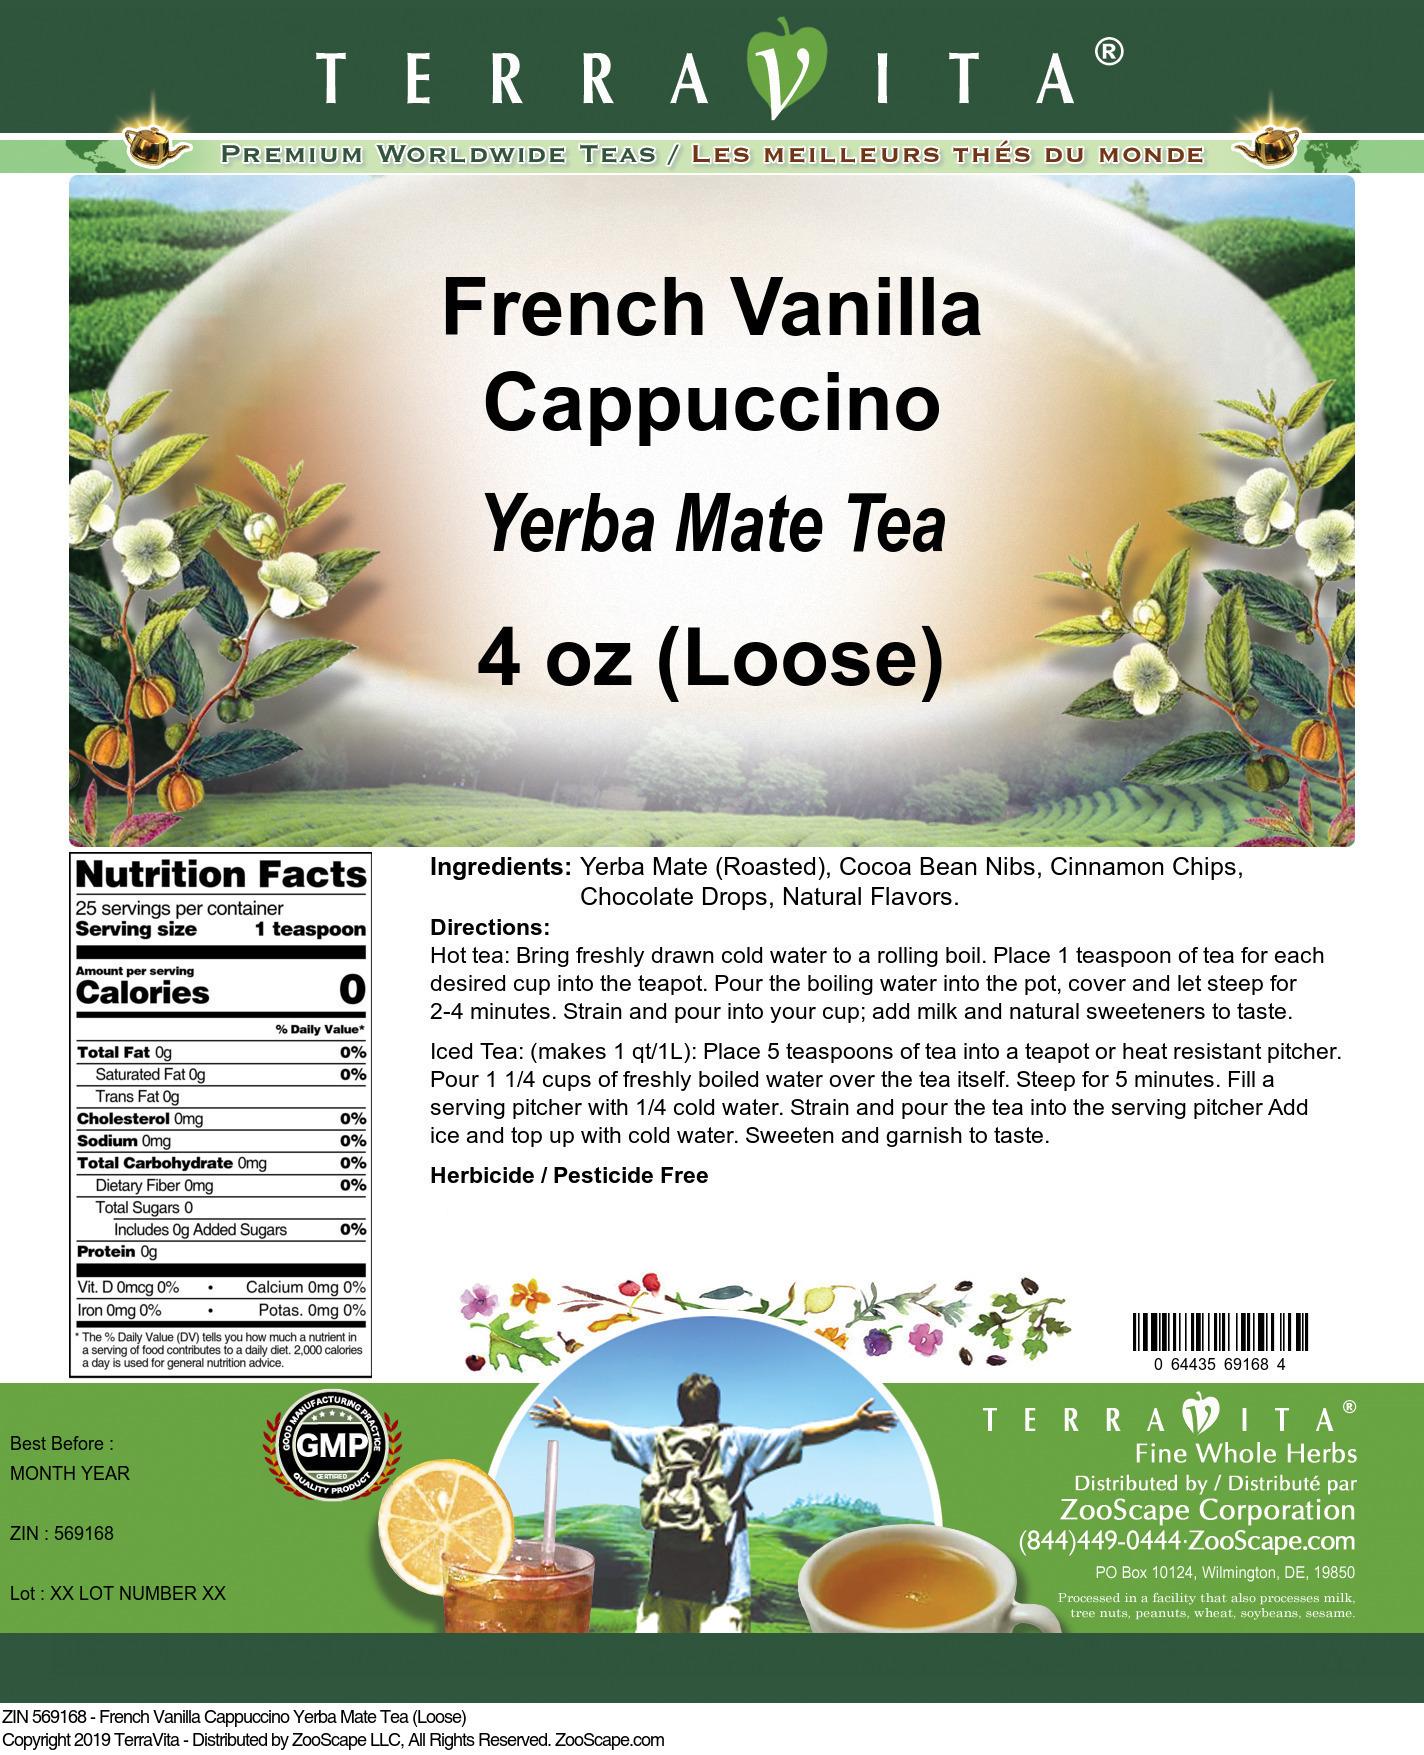 French Vanilla Cappuccino Yerba Mate Tea (Loose)